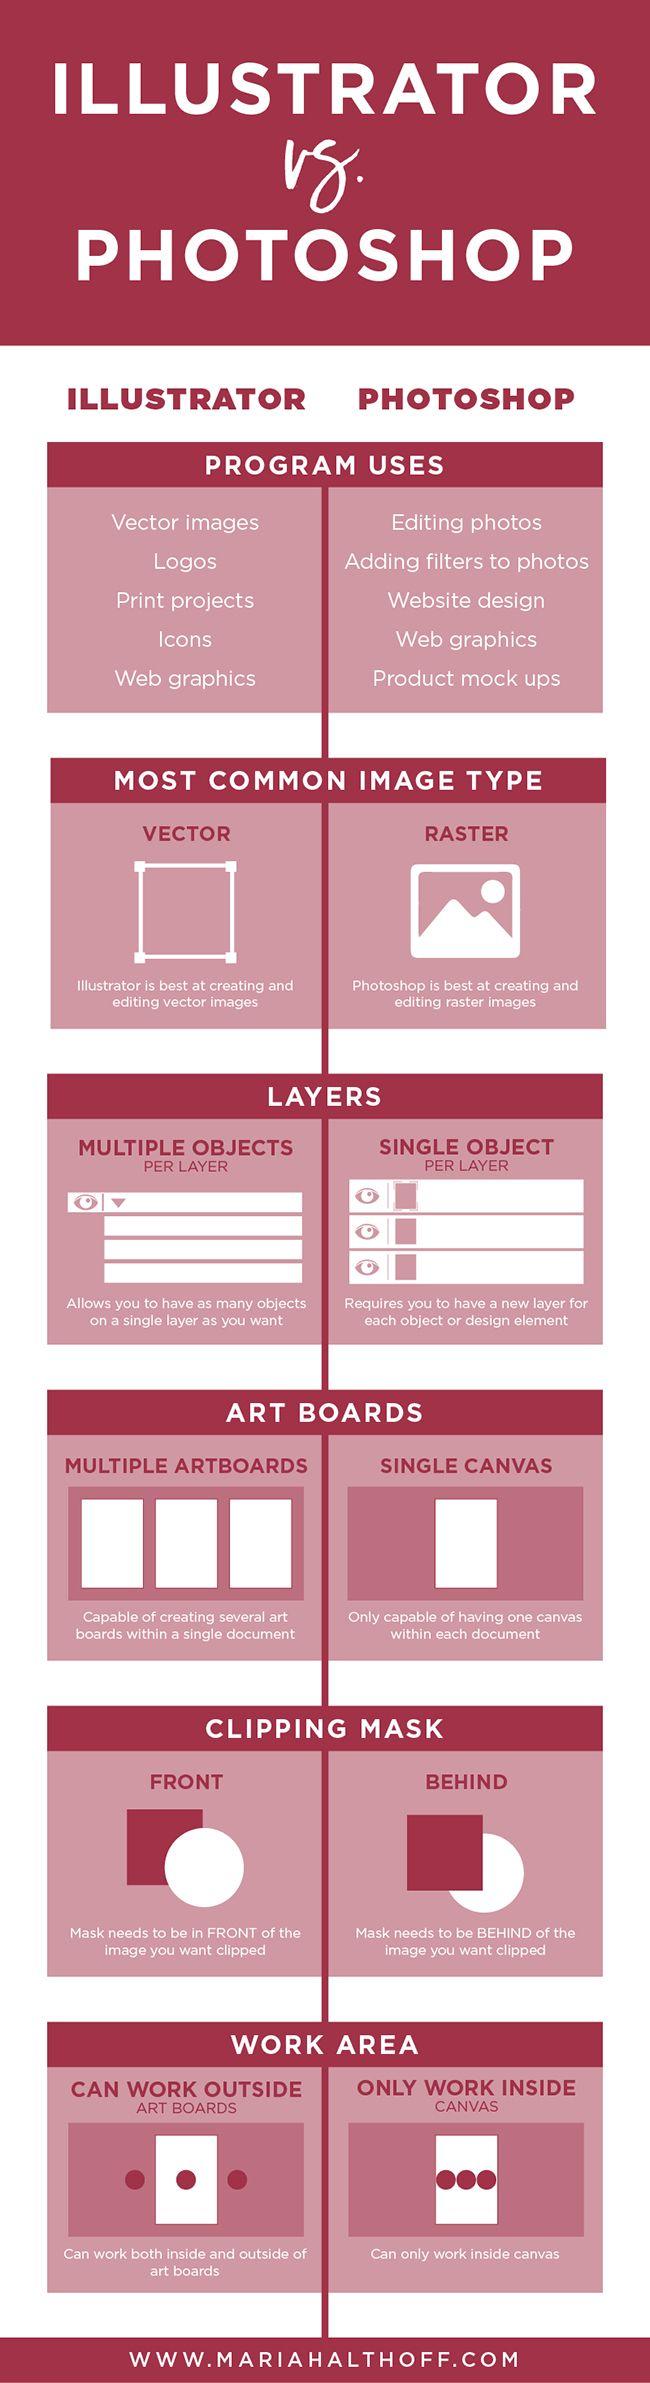 Infographic illustrator or photoshop